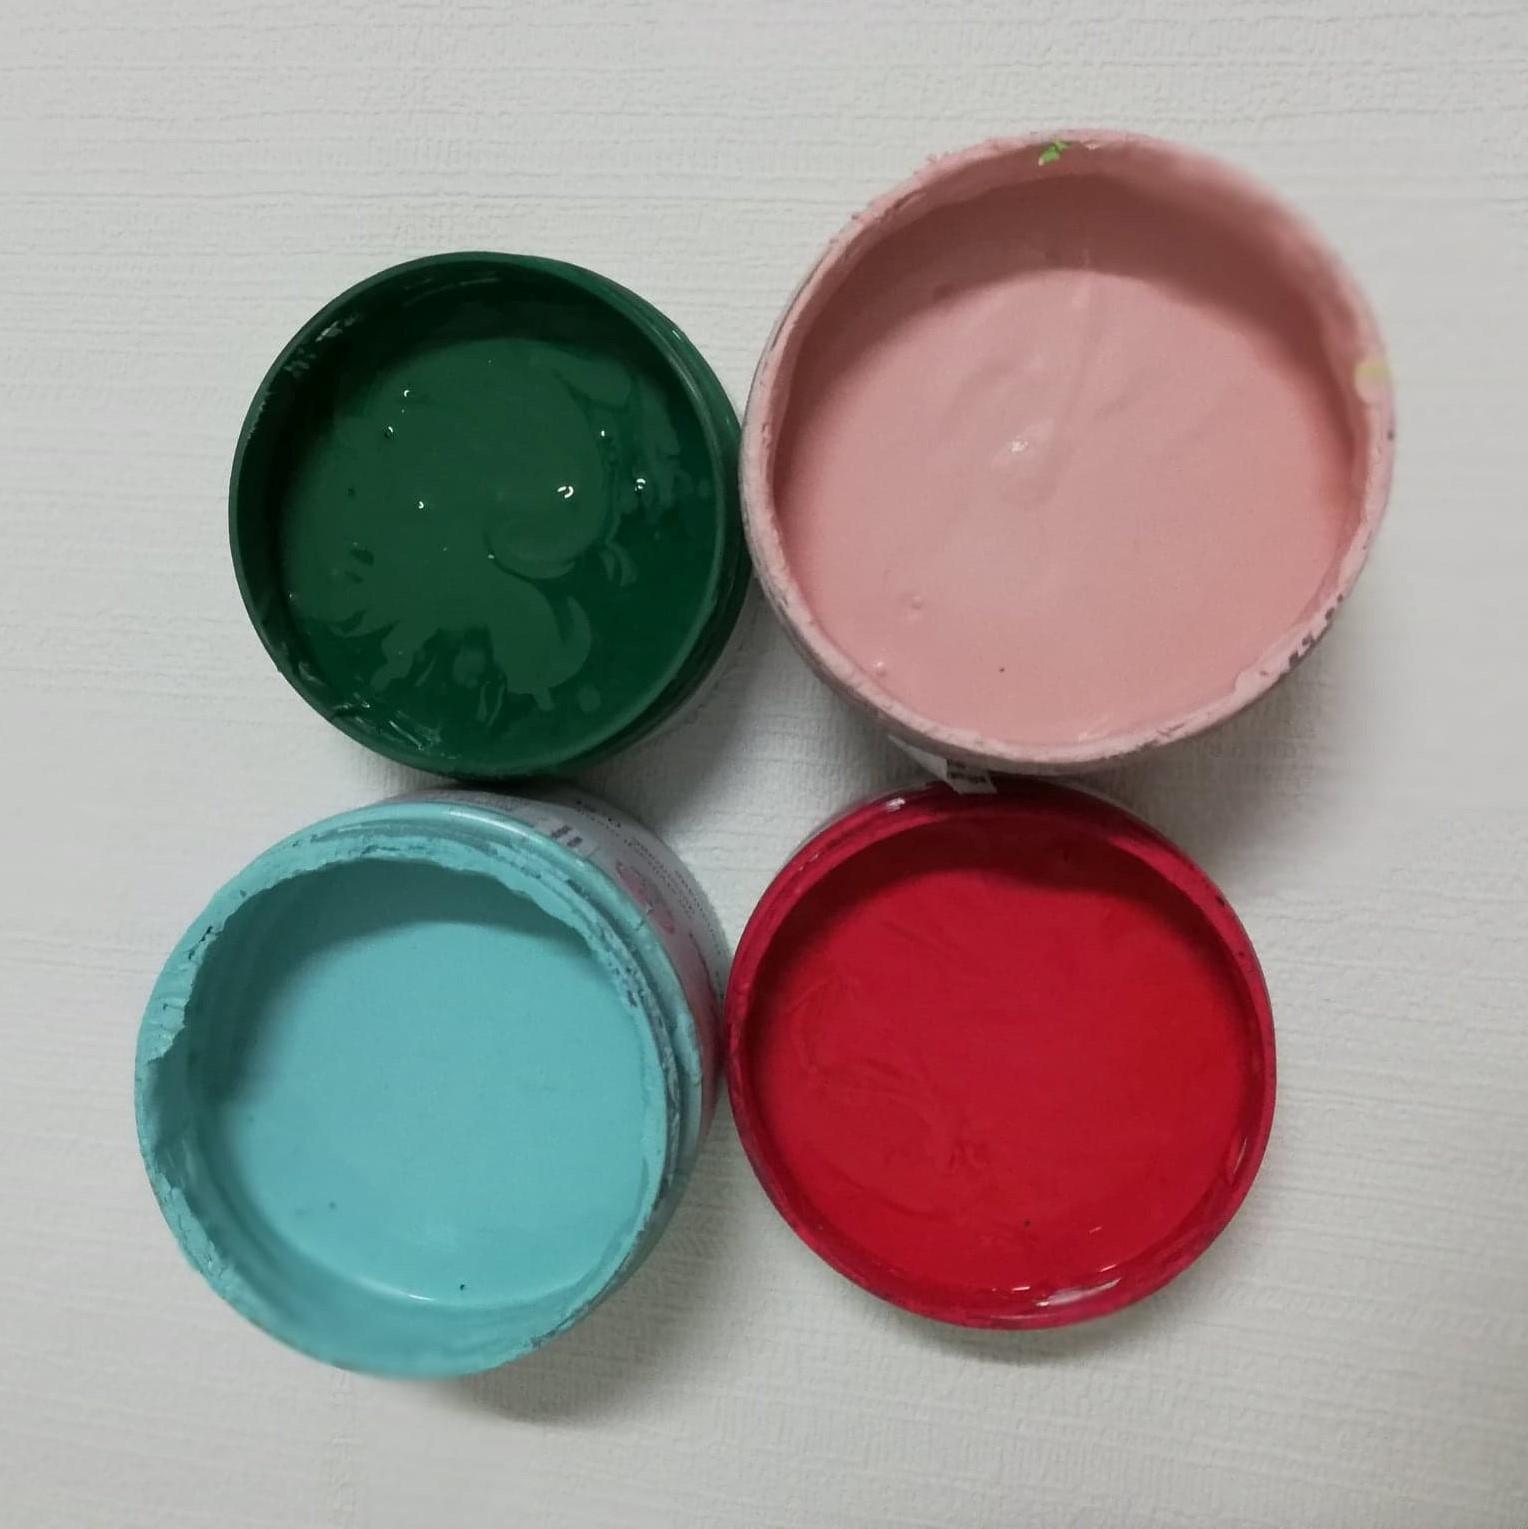 Kriedové farby - Chalk paint 🎨🖌 - Obrázok č. 39